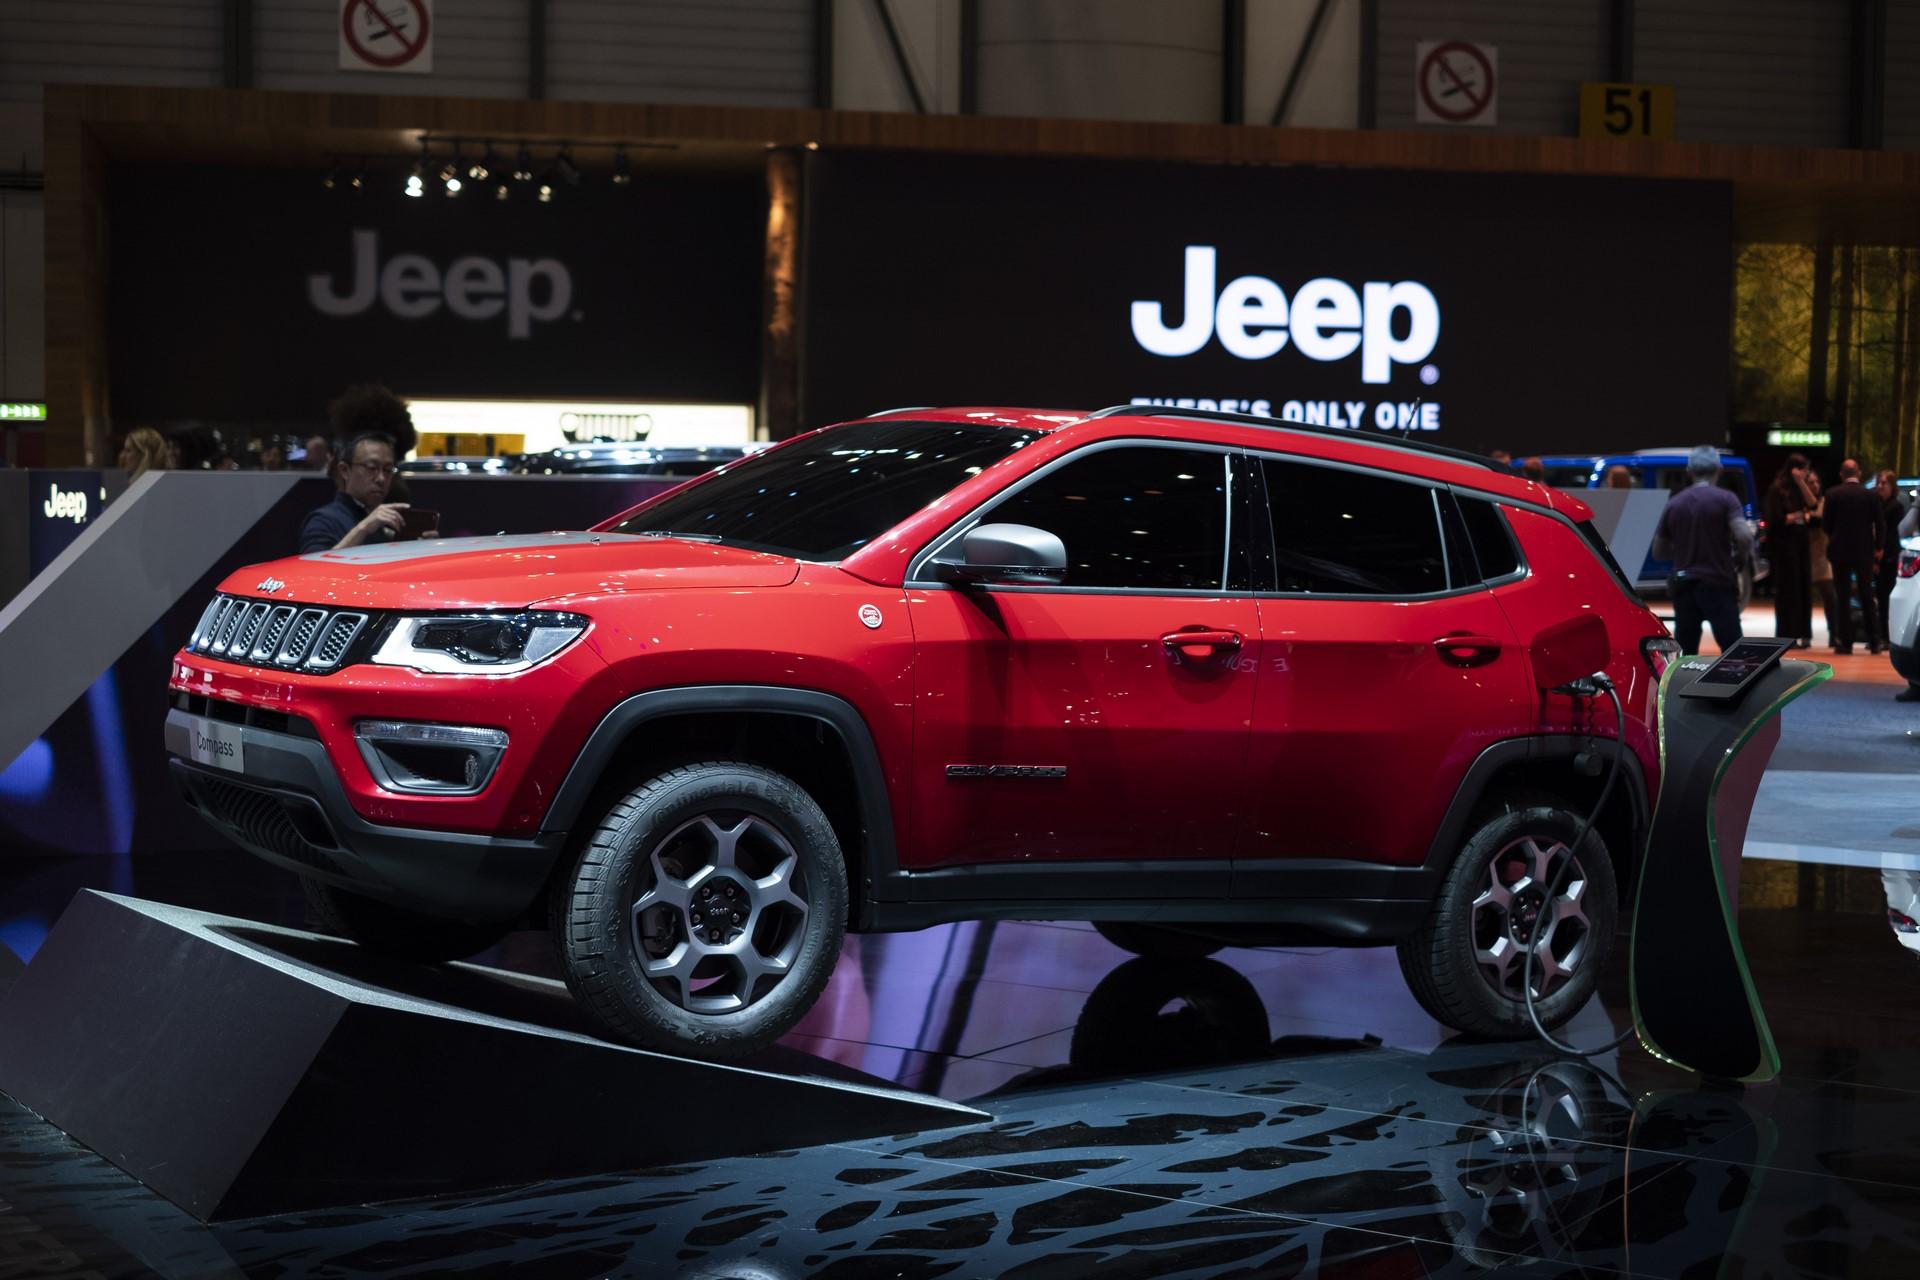 jeep geneva 2019 (2)